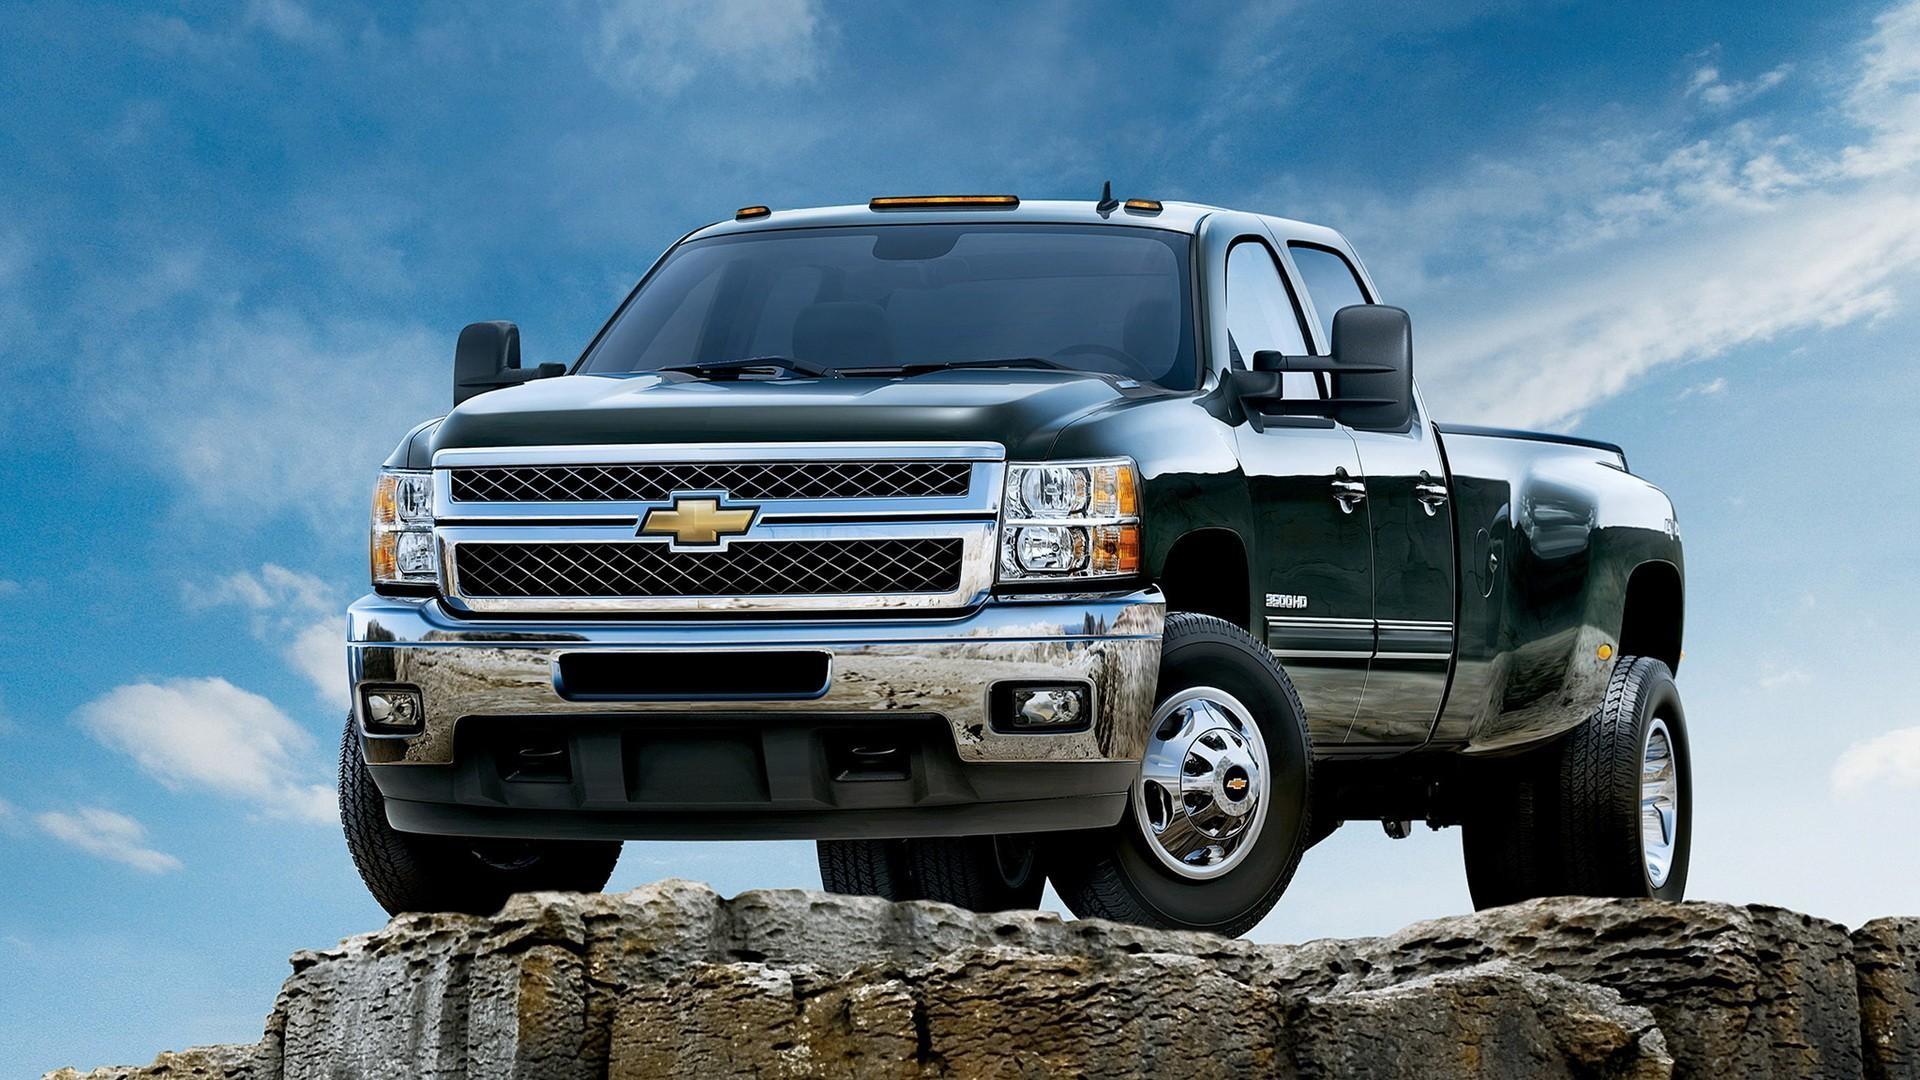 2014 Chevy Silverado Truck HD Wallpaper – HD